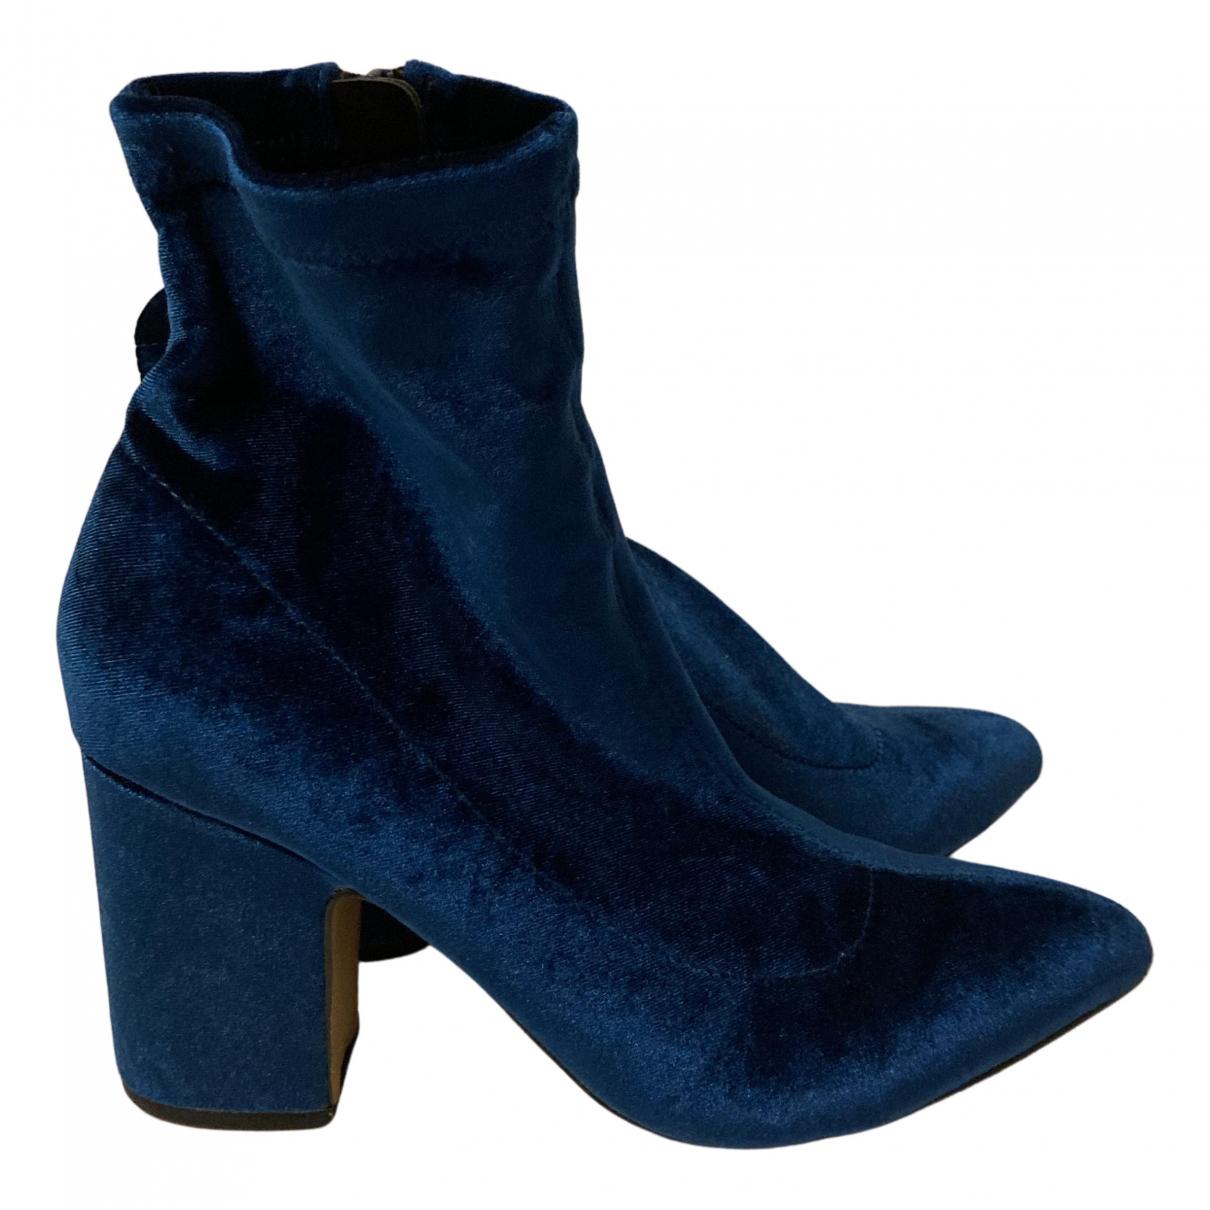 Steve Madden - Boots   pour femme en velours - bleu